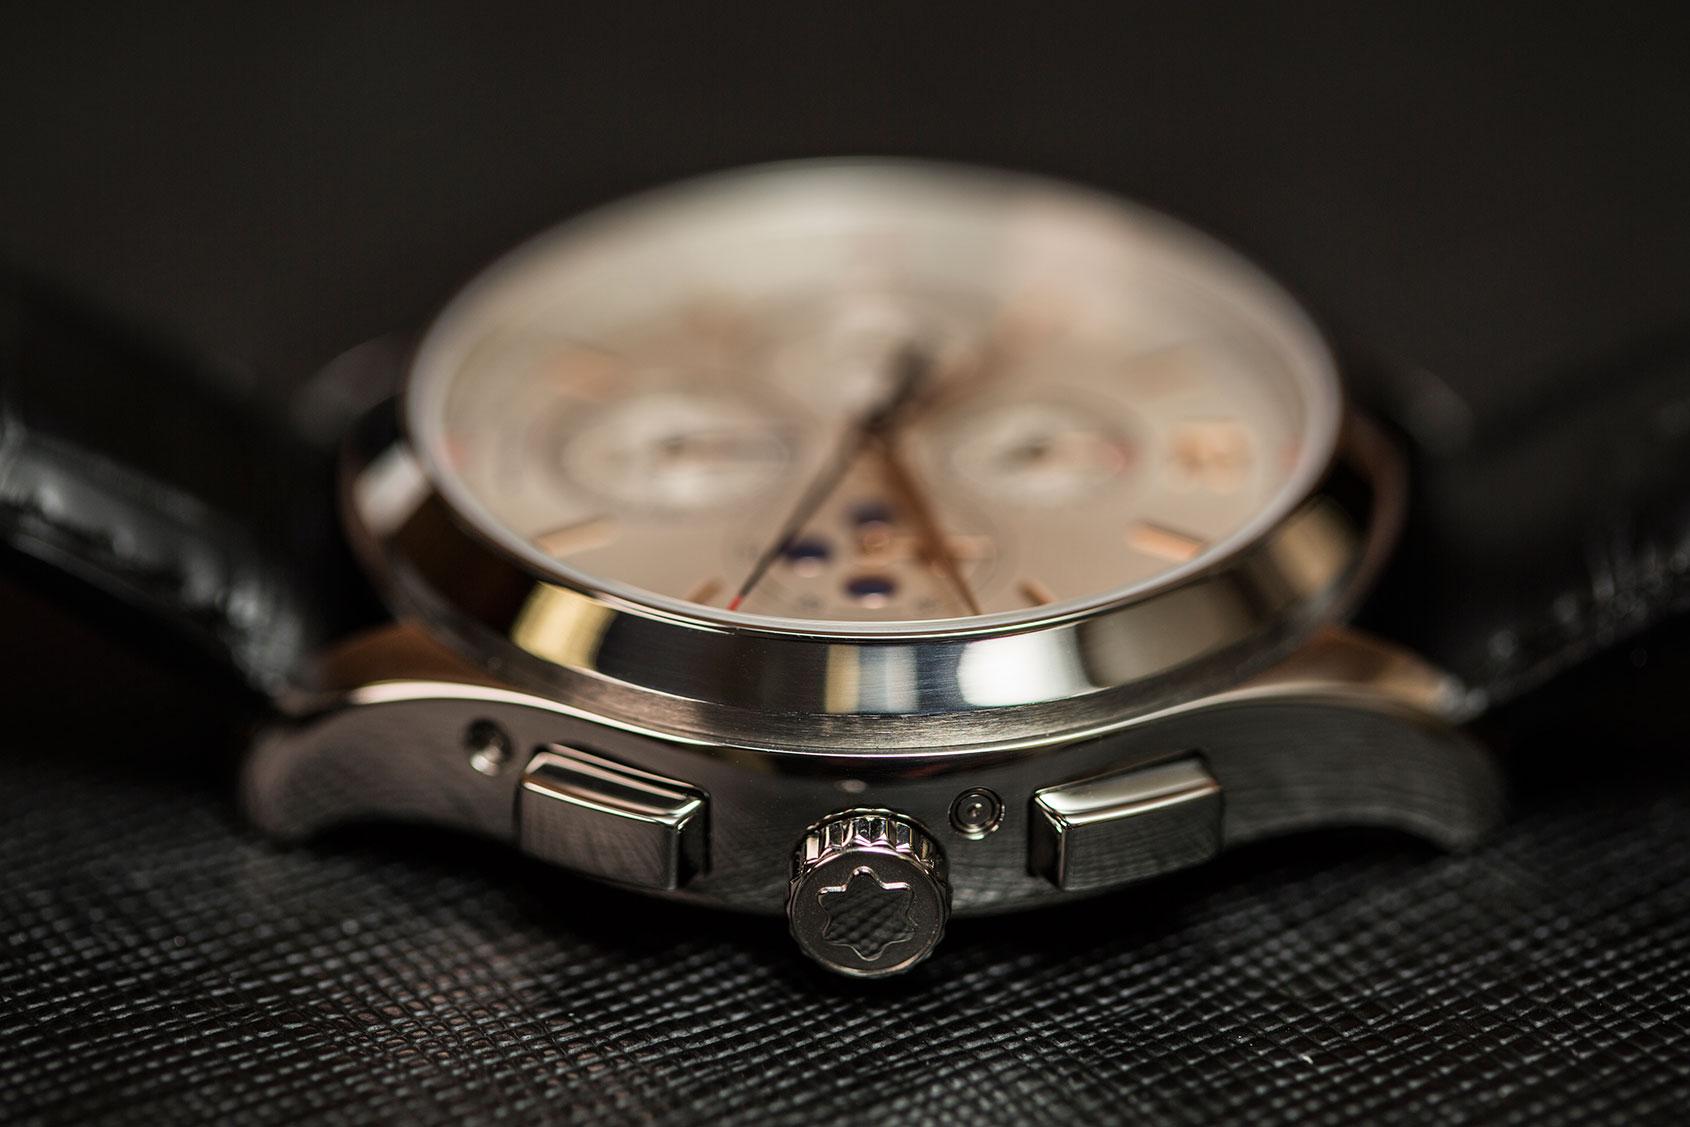 montblanc-heritage-chronometrie-annual-calendar-chronograph-1